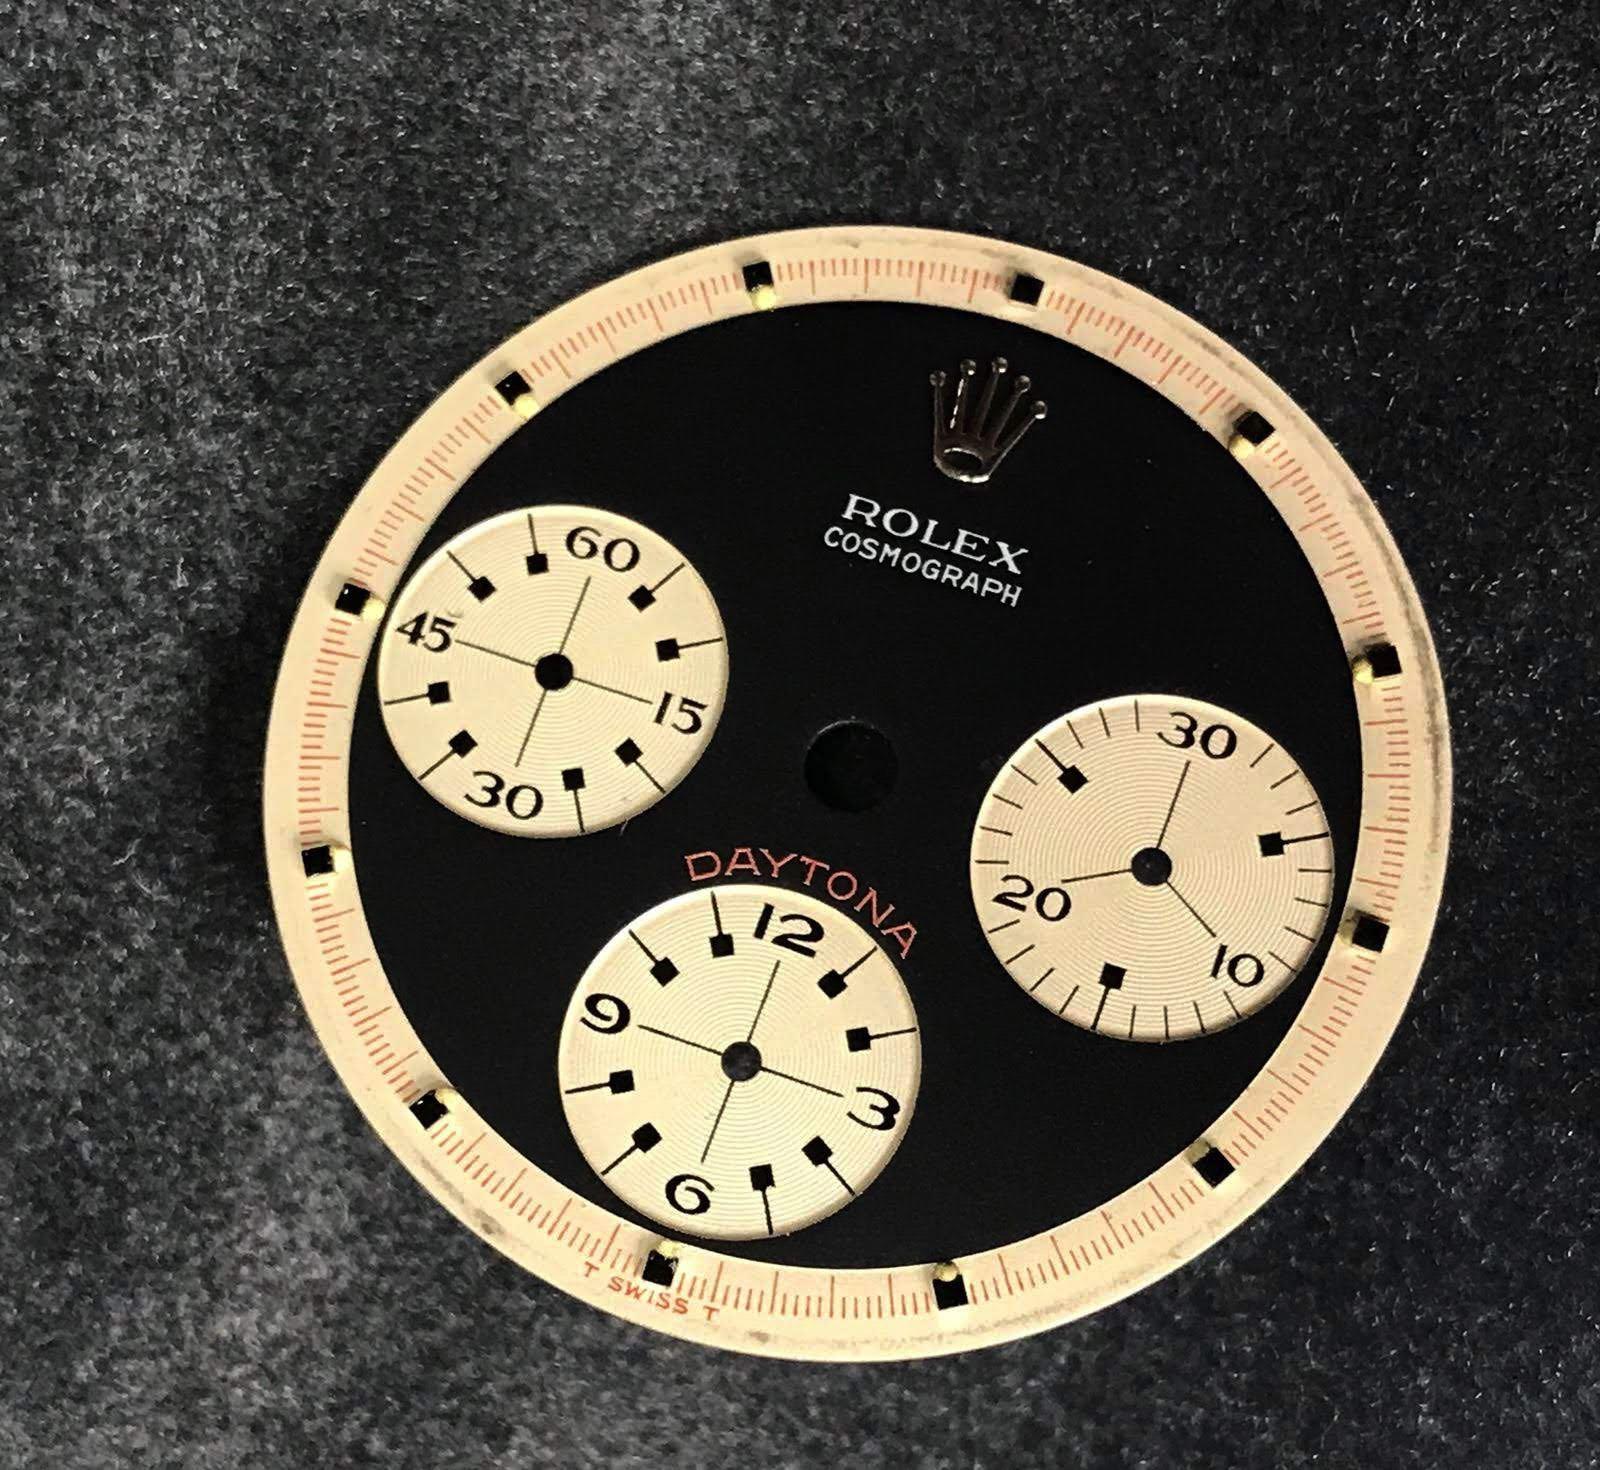 "Rolex Daytona ""Paul Newman"" 6240 wide t swiss t Three color black dial circa 1969 - Image 6 of 8"